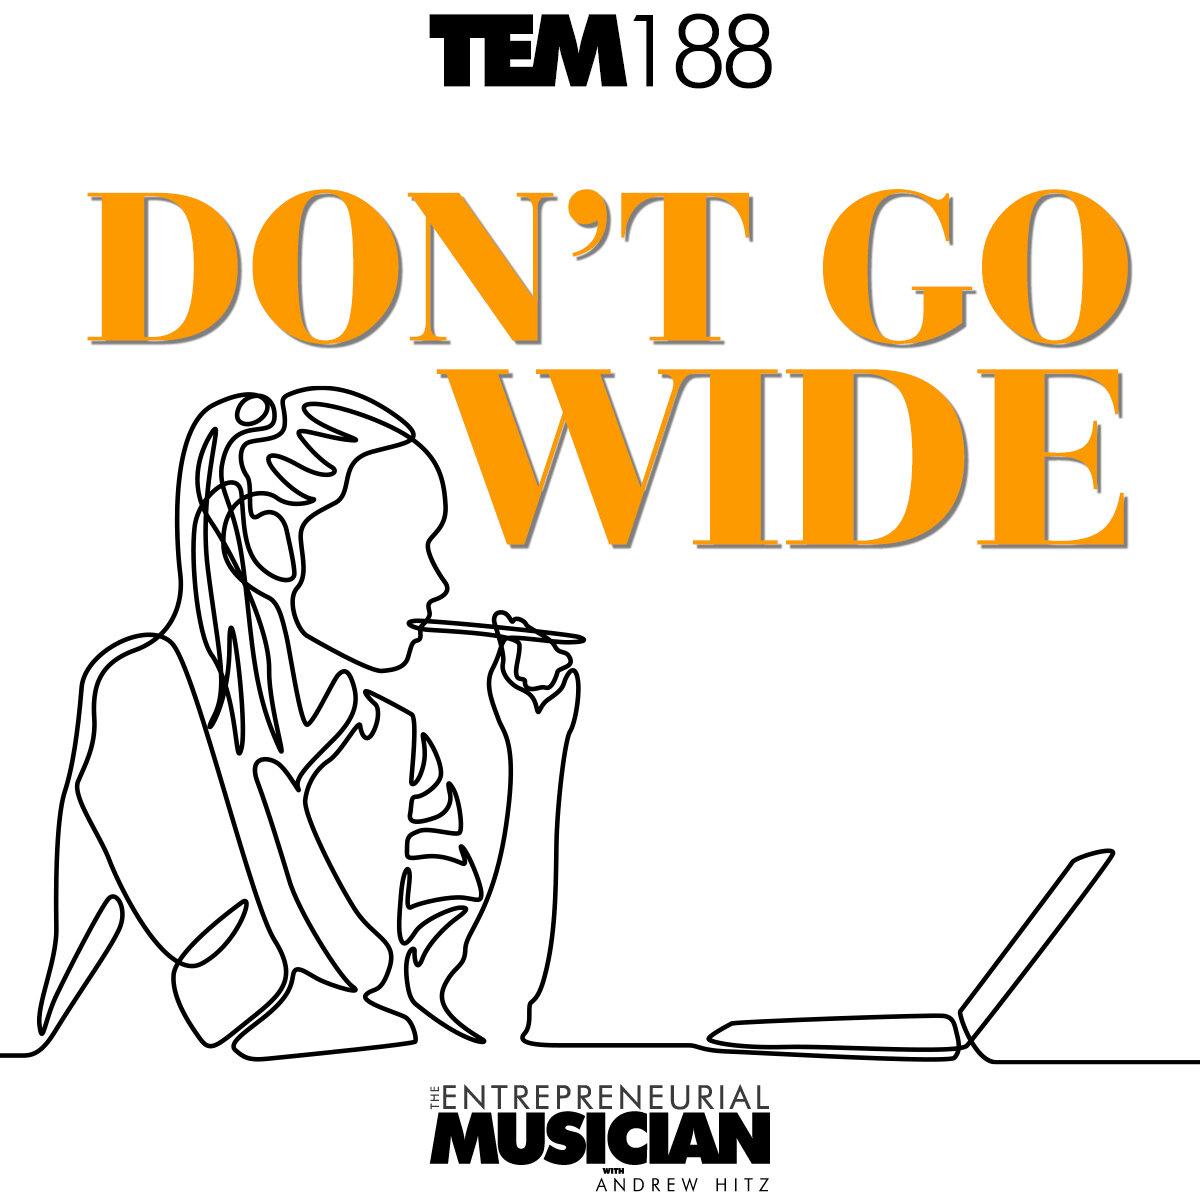 TEM188-Promo.jpg